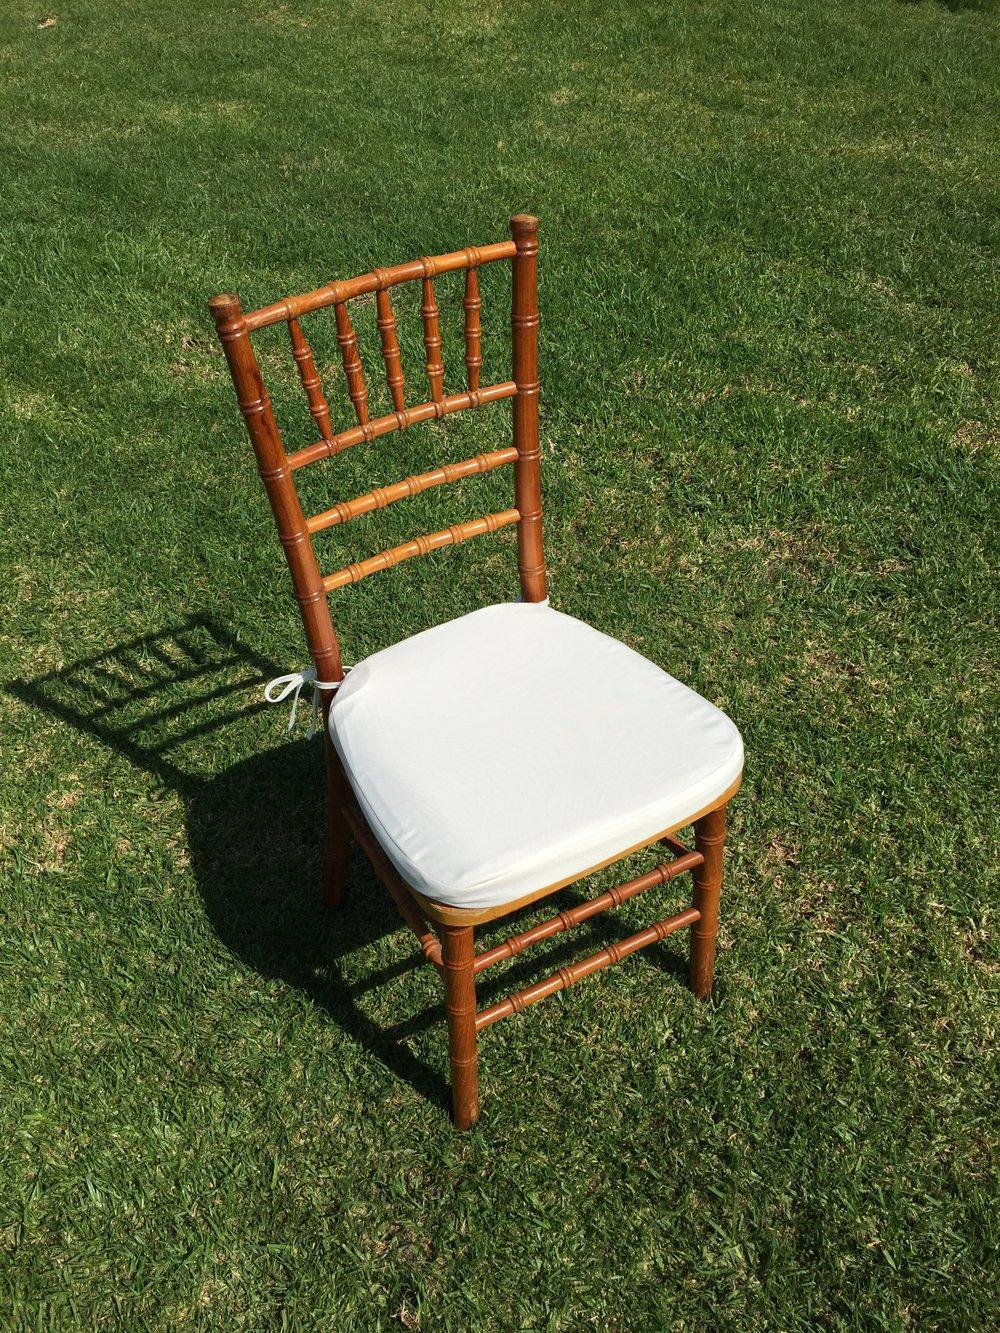 fruit-wood-chair-300x225.jpg